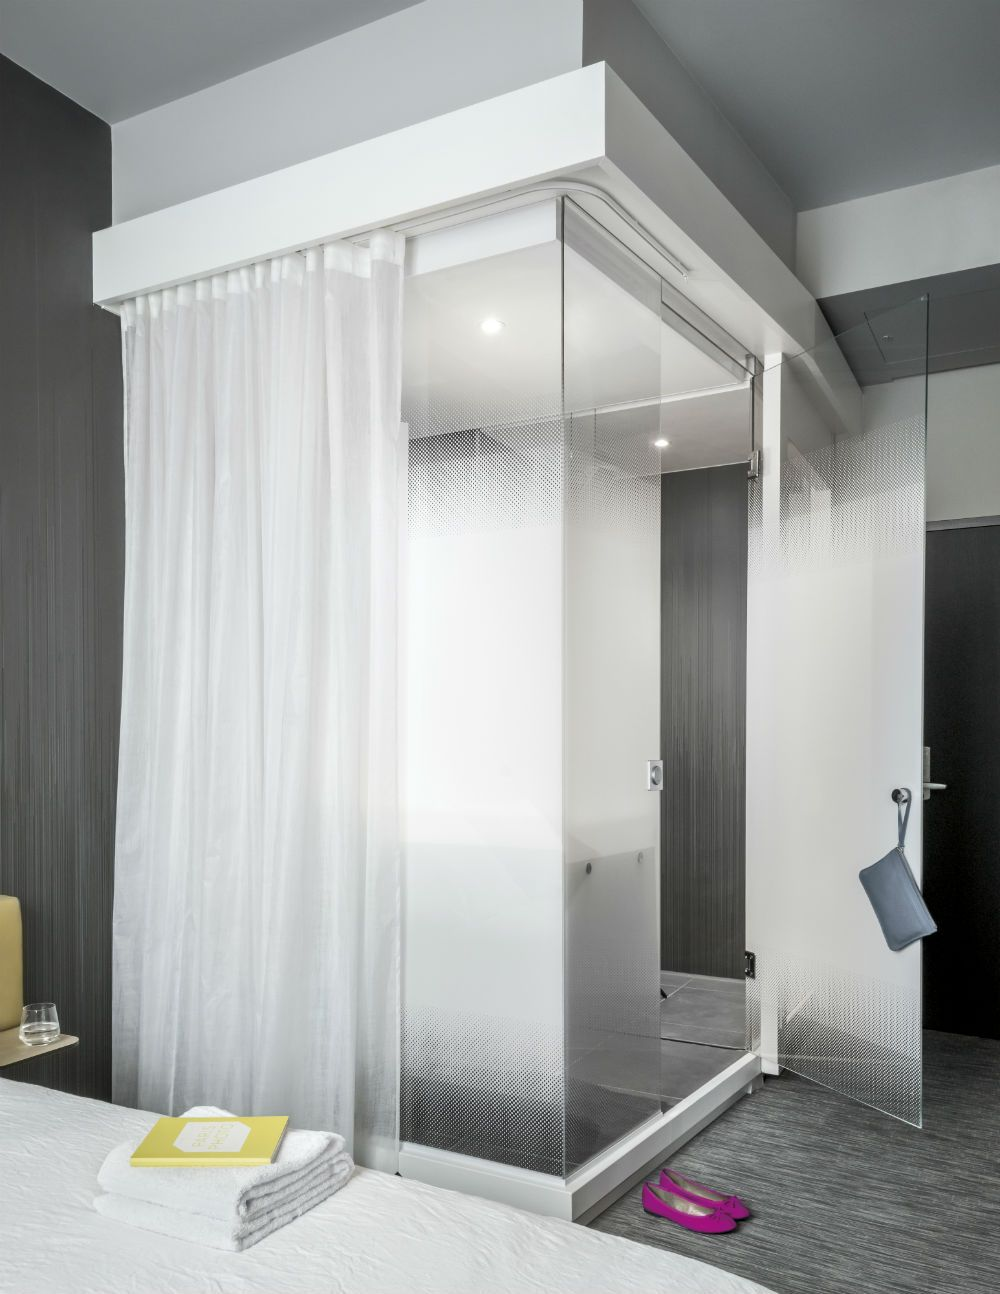 la salle de bain okko hotels lyon pont lafayette salle salle de bain und lyon. Black Bedroom Furniture Sets. Home Design Ideas